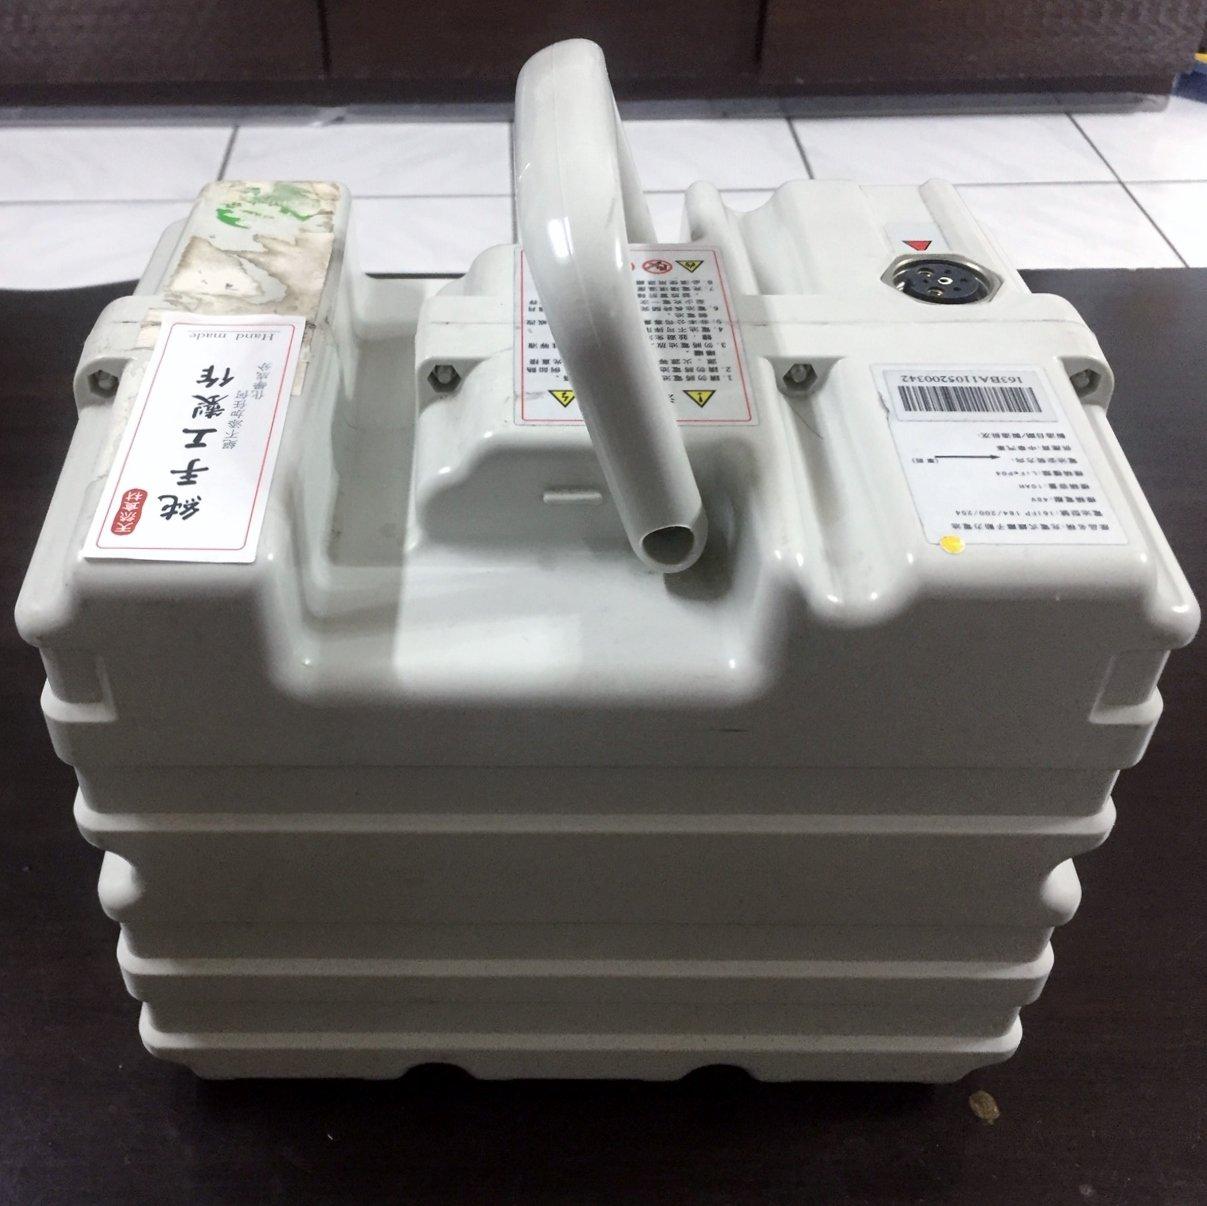 e-moving emoving中華電動二輪車 中華電動摩托車 電動機車 電池芯更新 電池改裝 電瓶改裝 磷酸鋰鐵電池